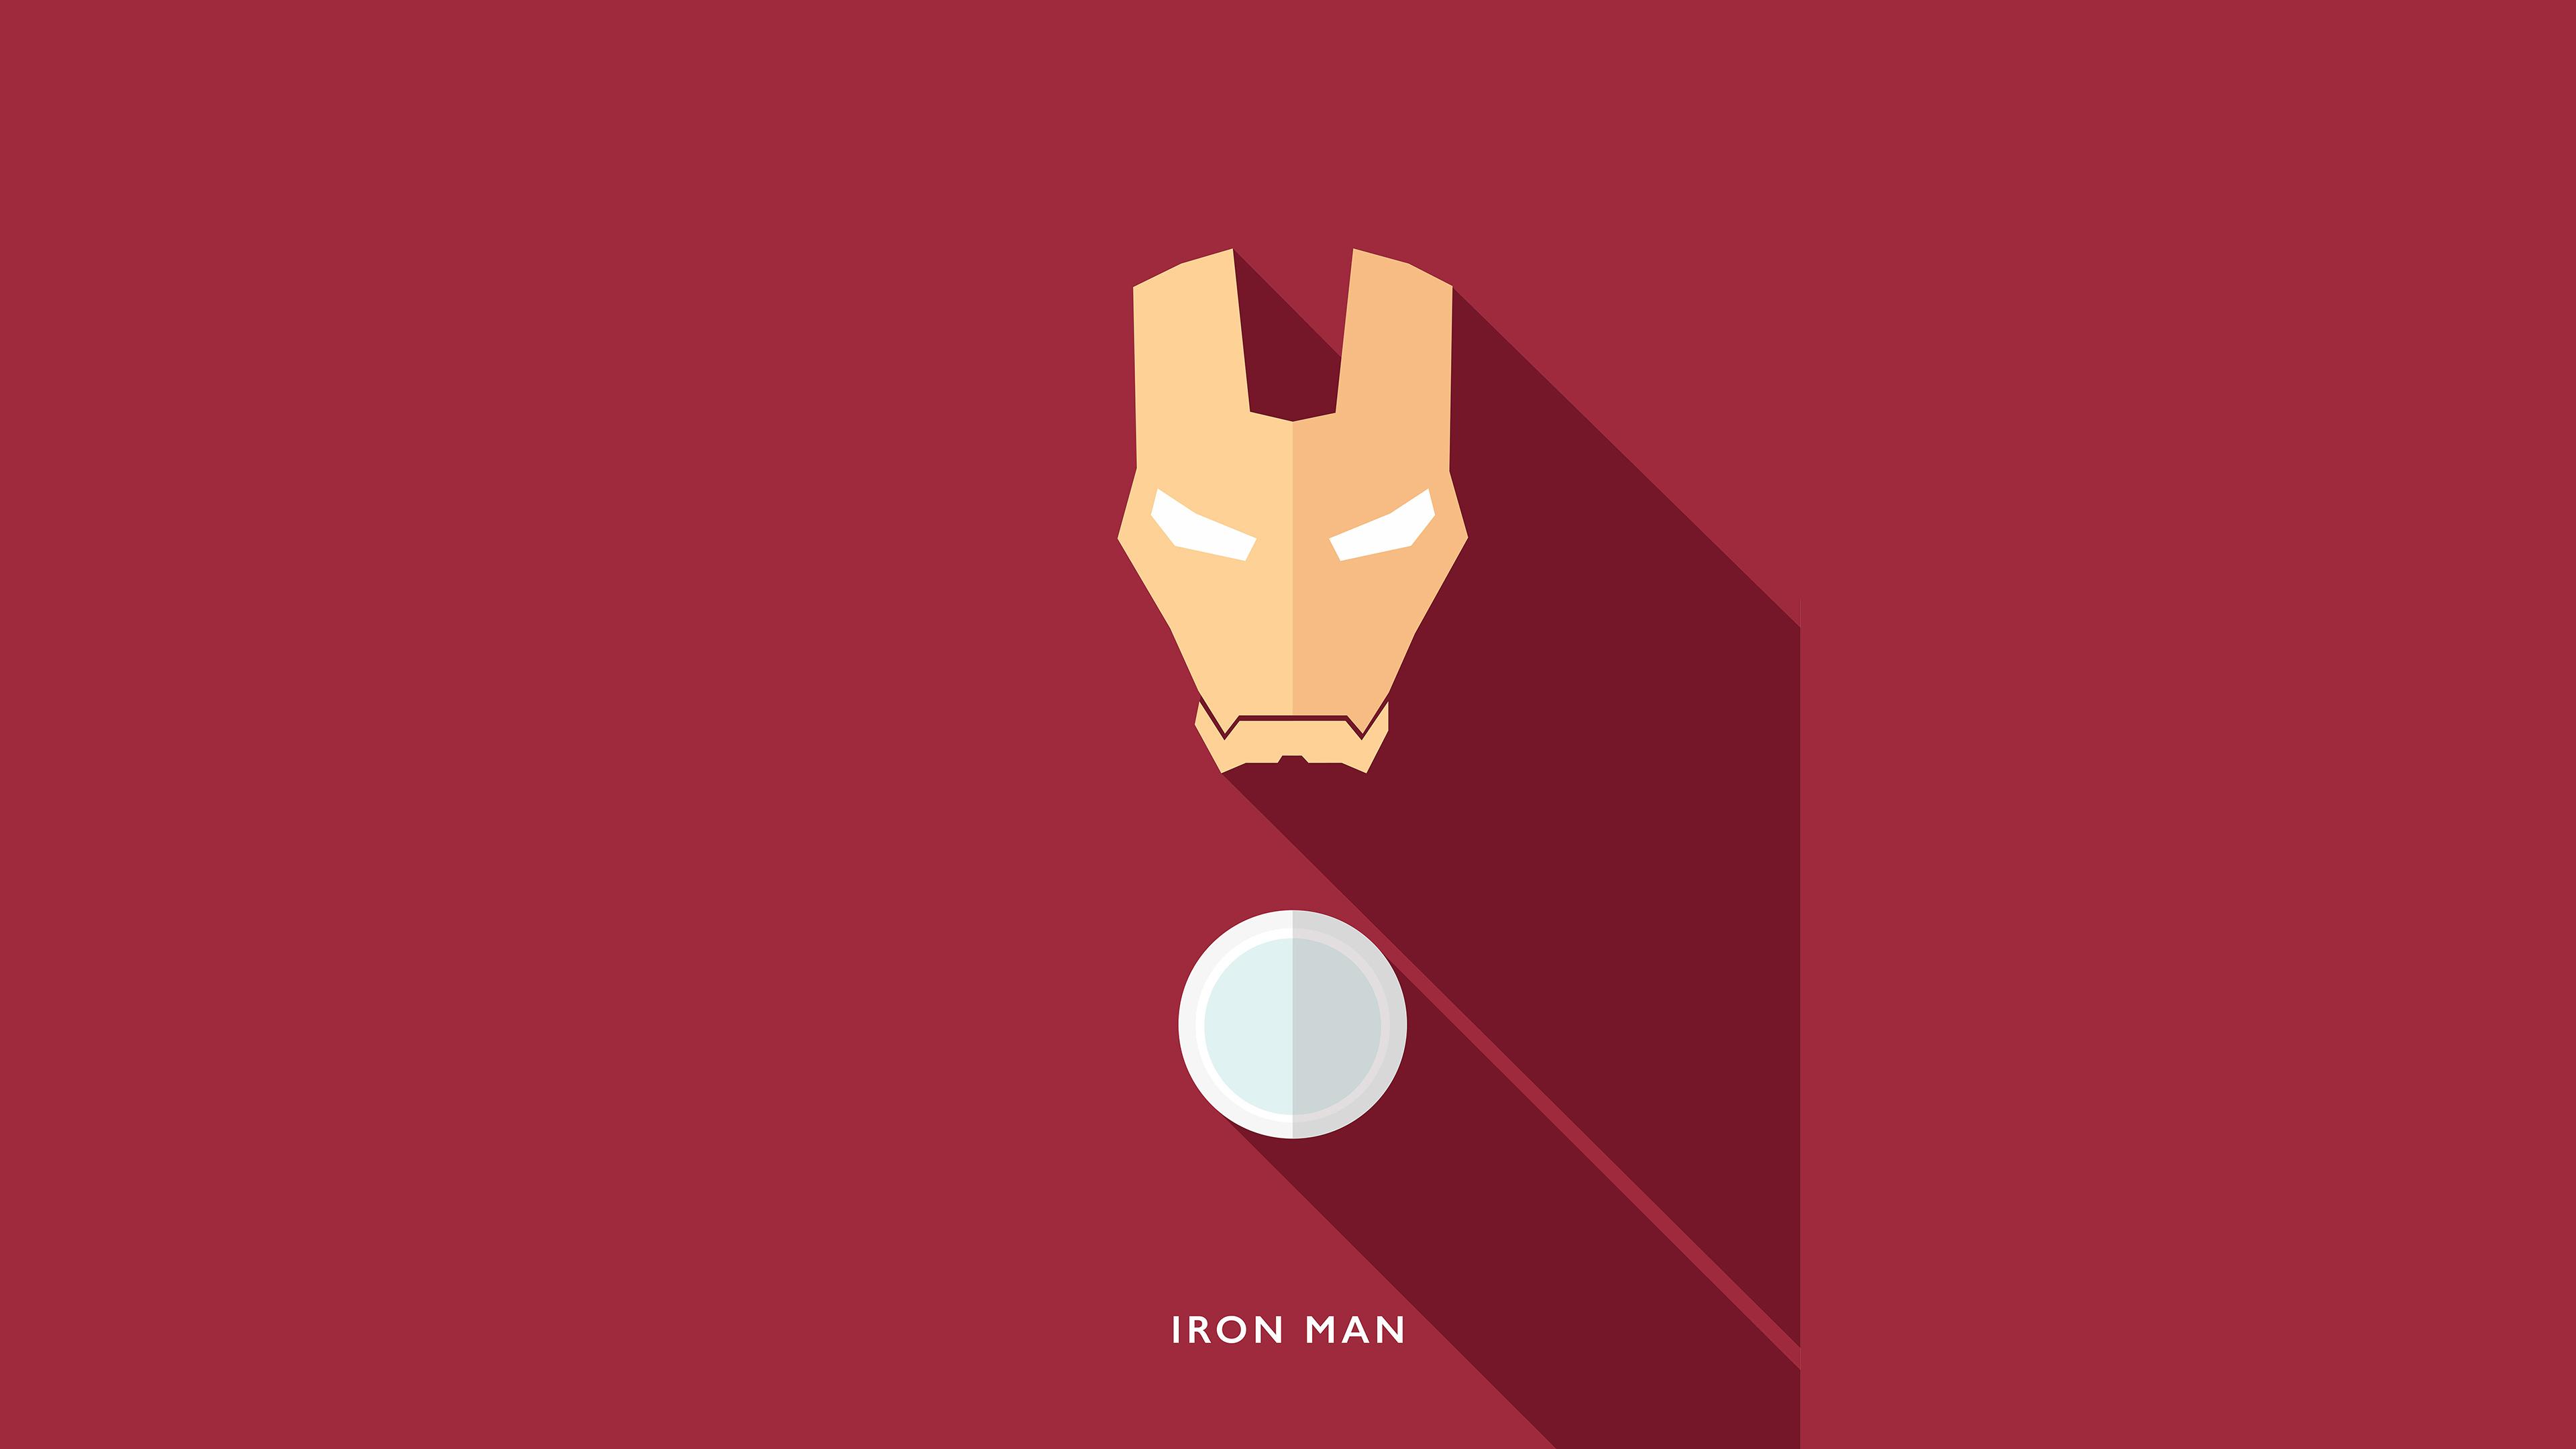 iron man minimalists 4k 1553071714 - Iron Man Minimalists 4k - superheroes wallpapers, minimalist wallpapers, minimalism wallpapers, iron man wallpapers, hd-wallpapers, digital art wallpapers, behance wallpapers, artwork wallpapers, artist wallpapers, 4k-wallpapers